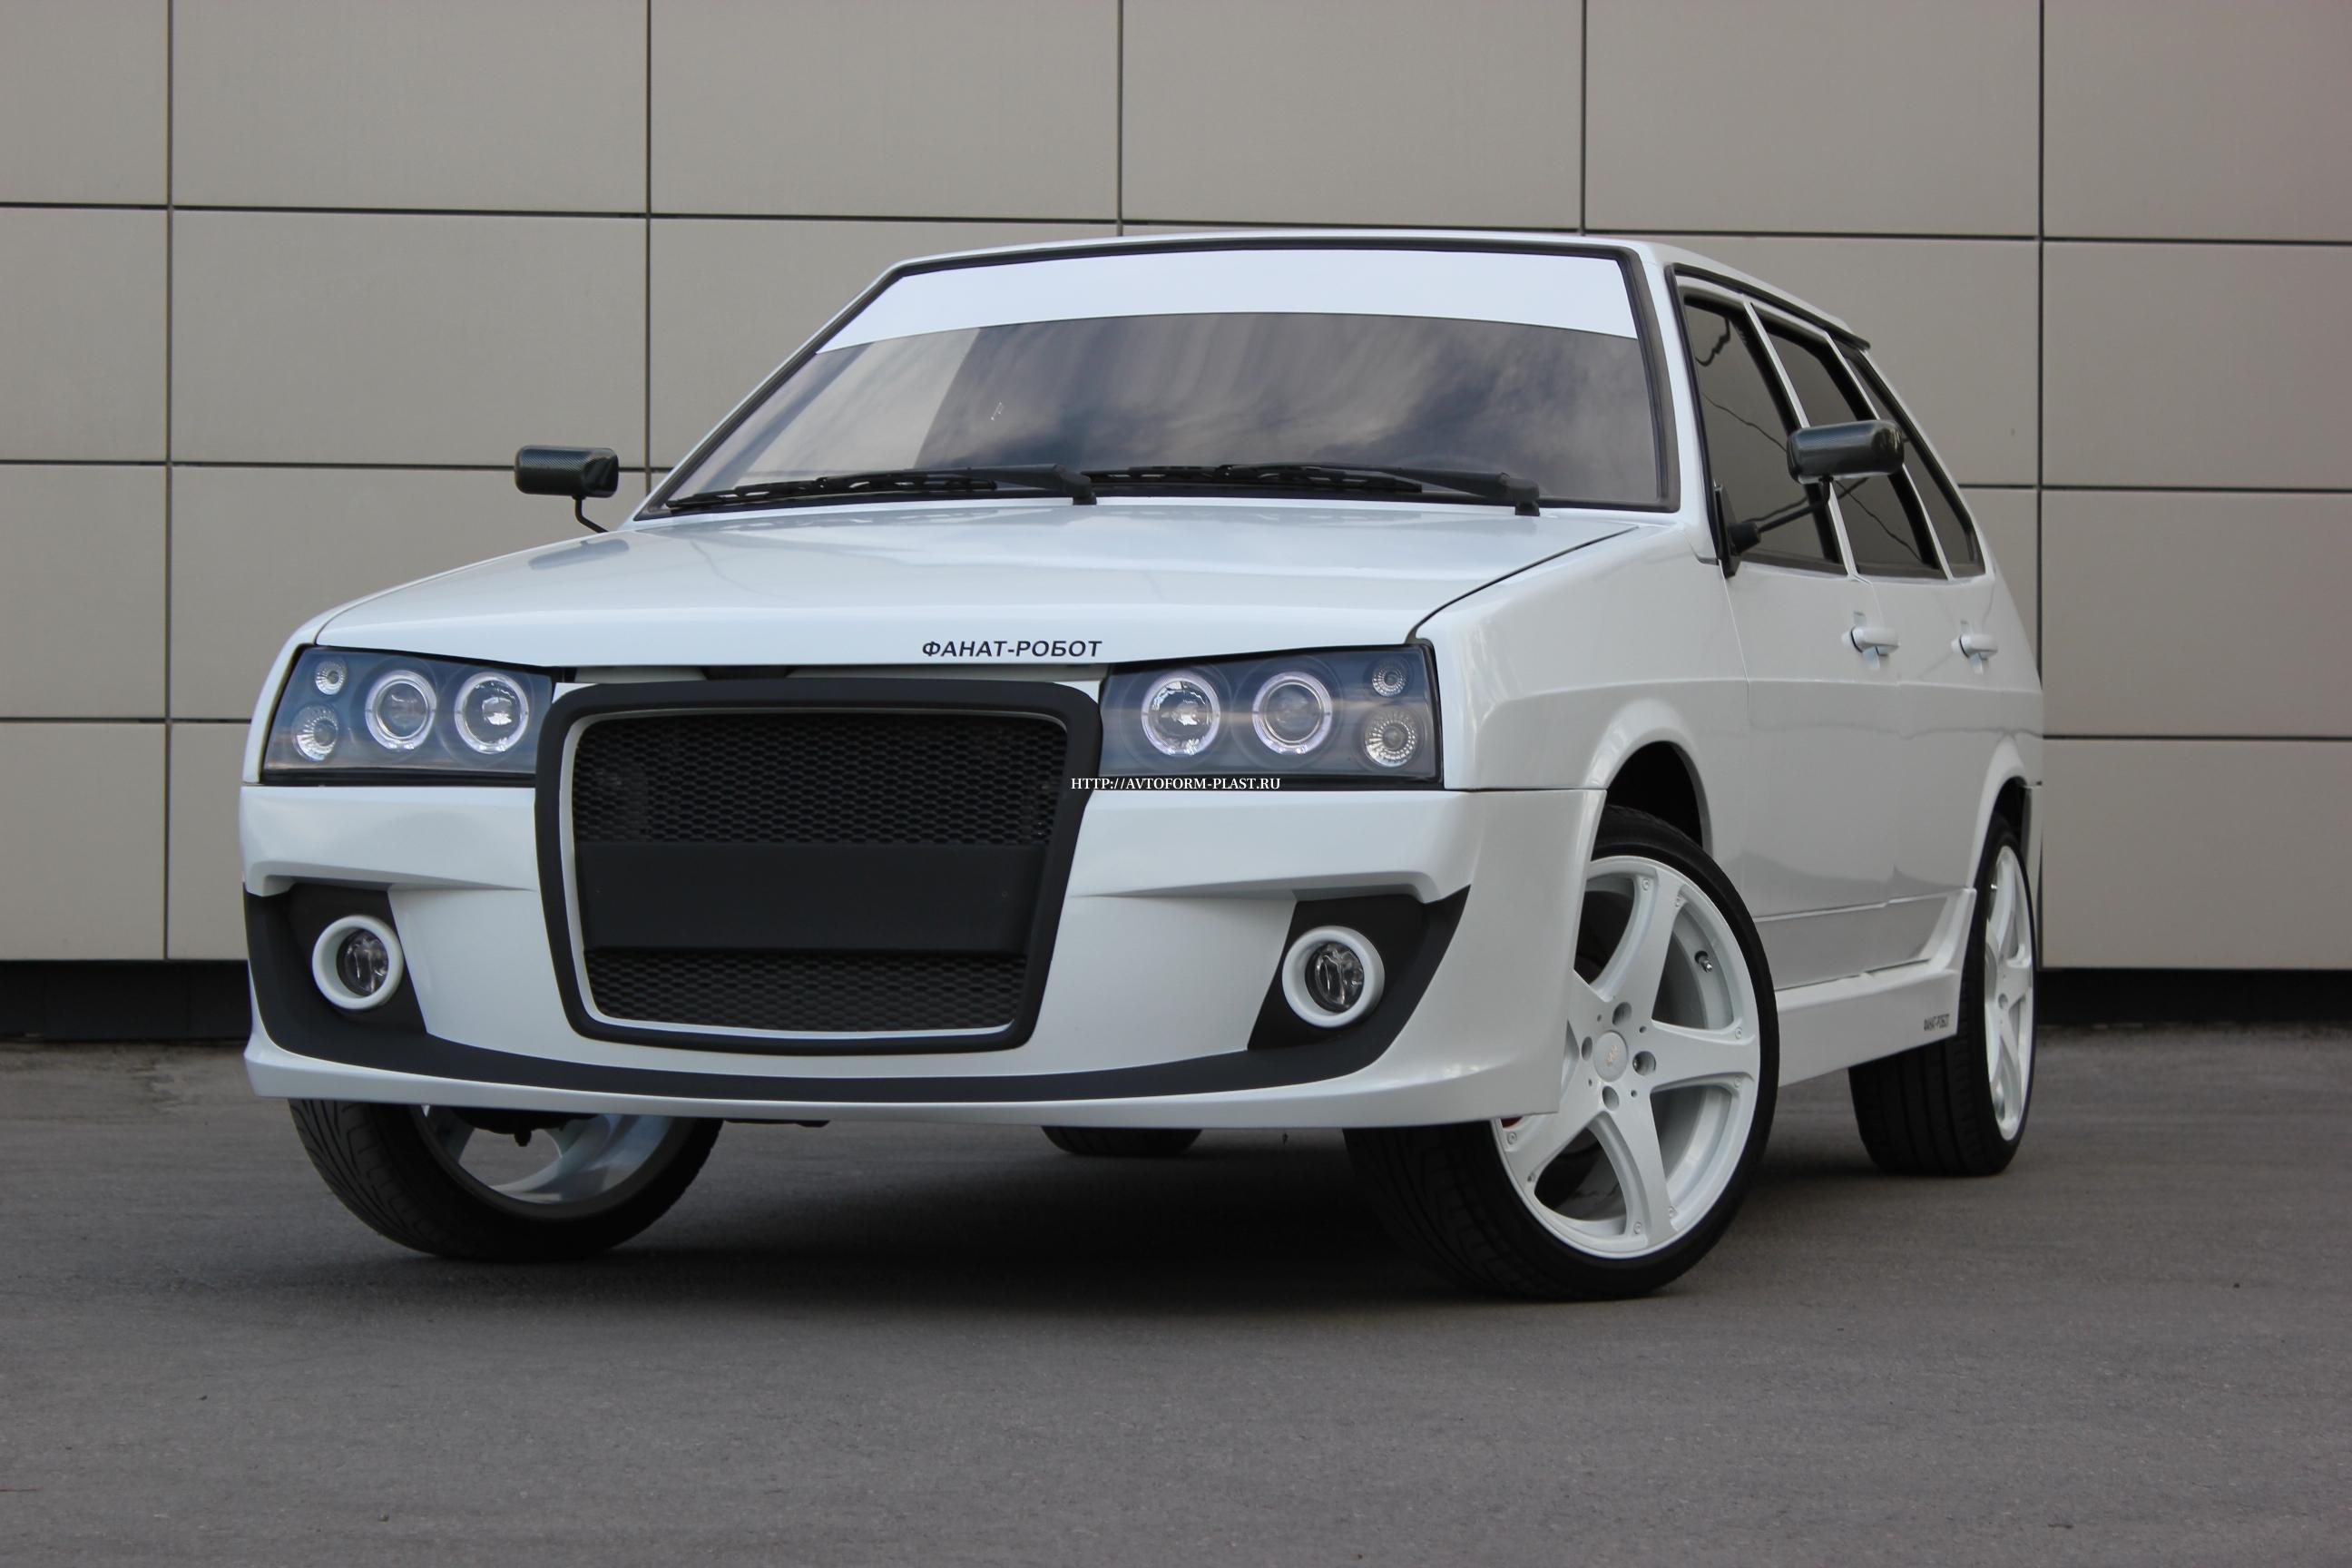 Глубокий тюнинг автомобиля ВАЗ 2109. Статья — фотоподборка